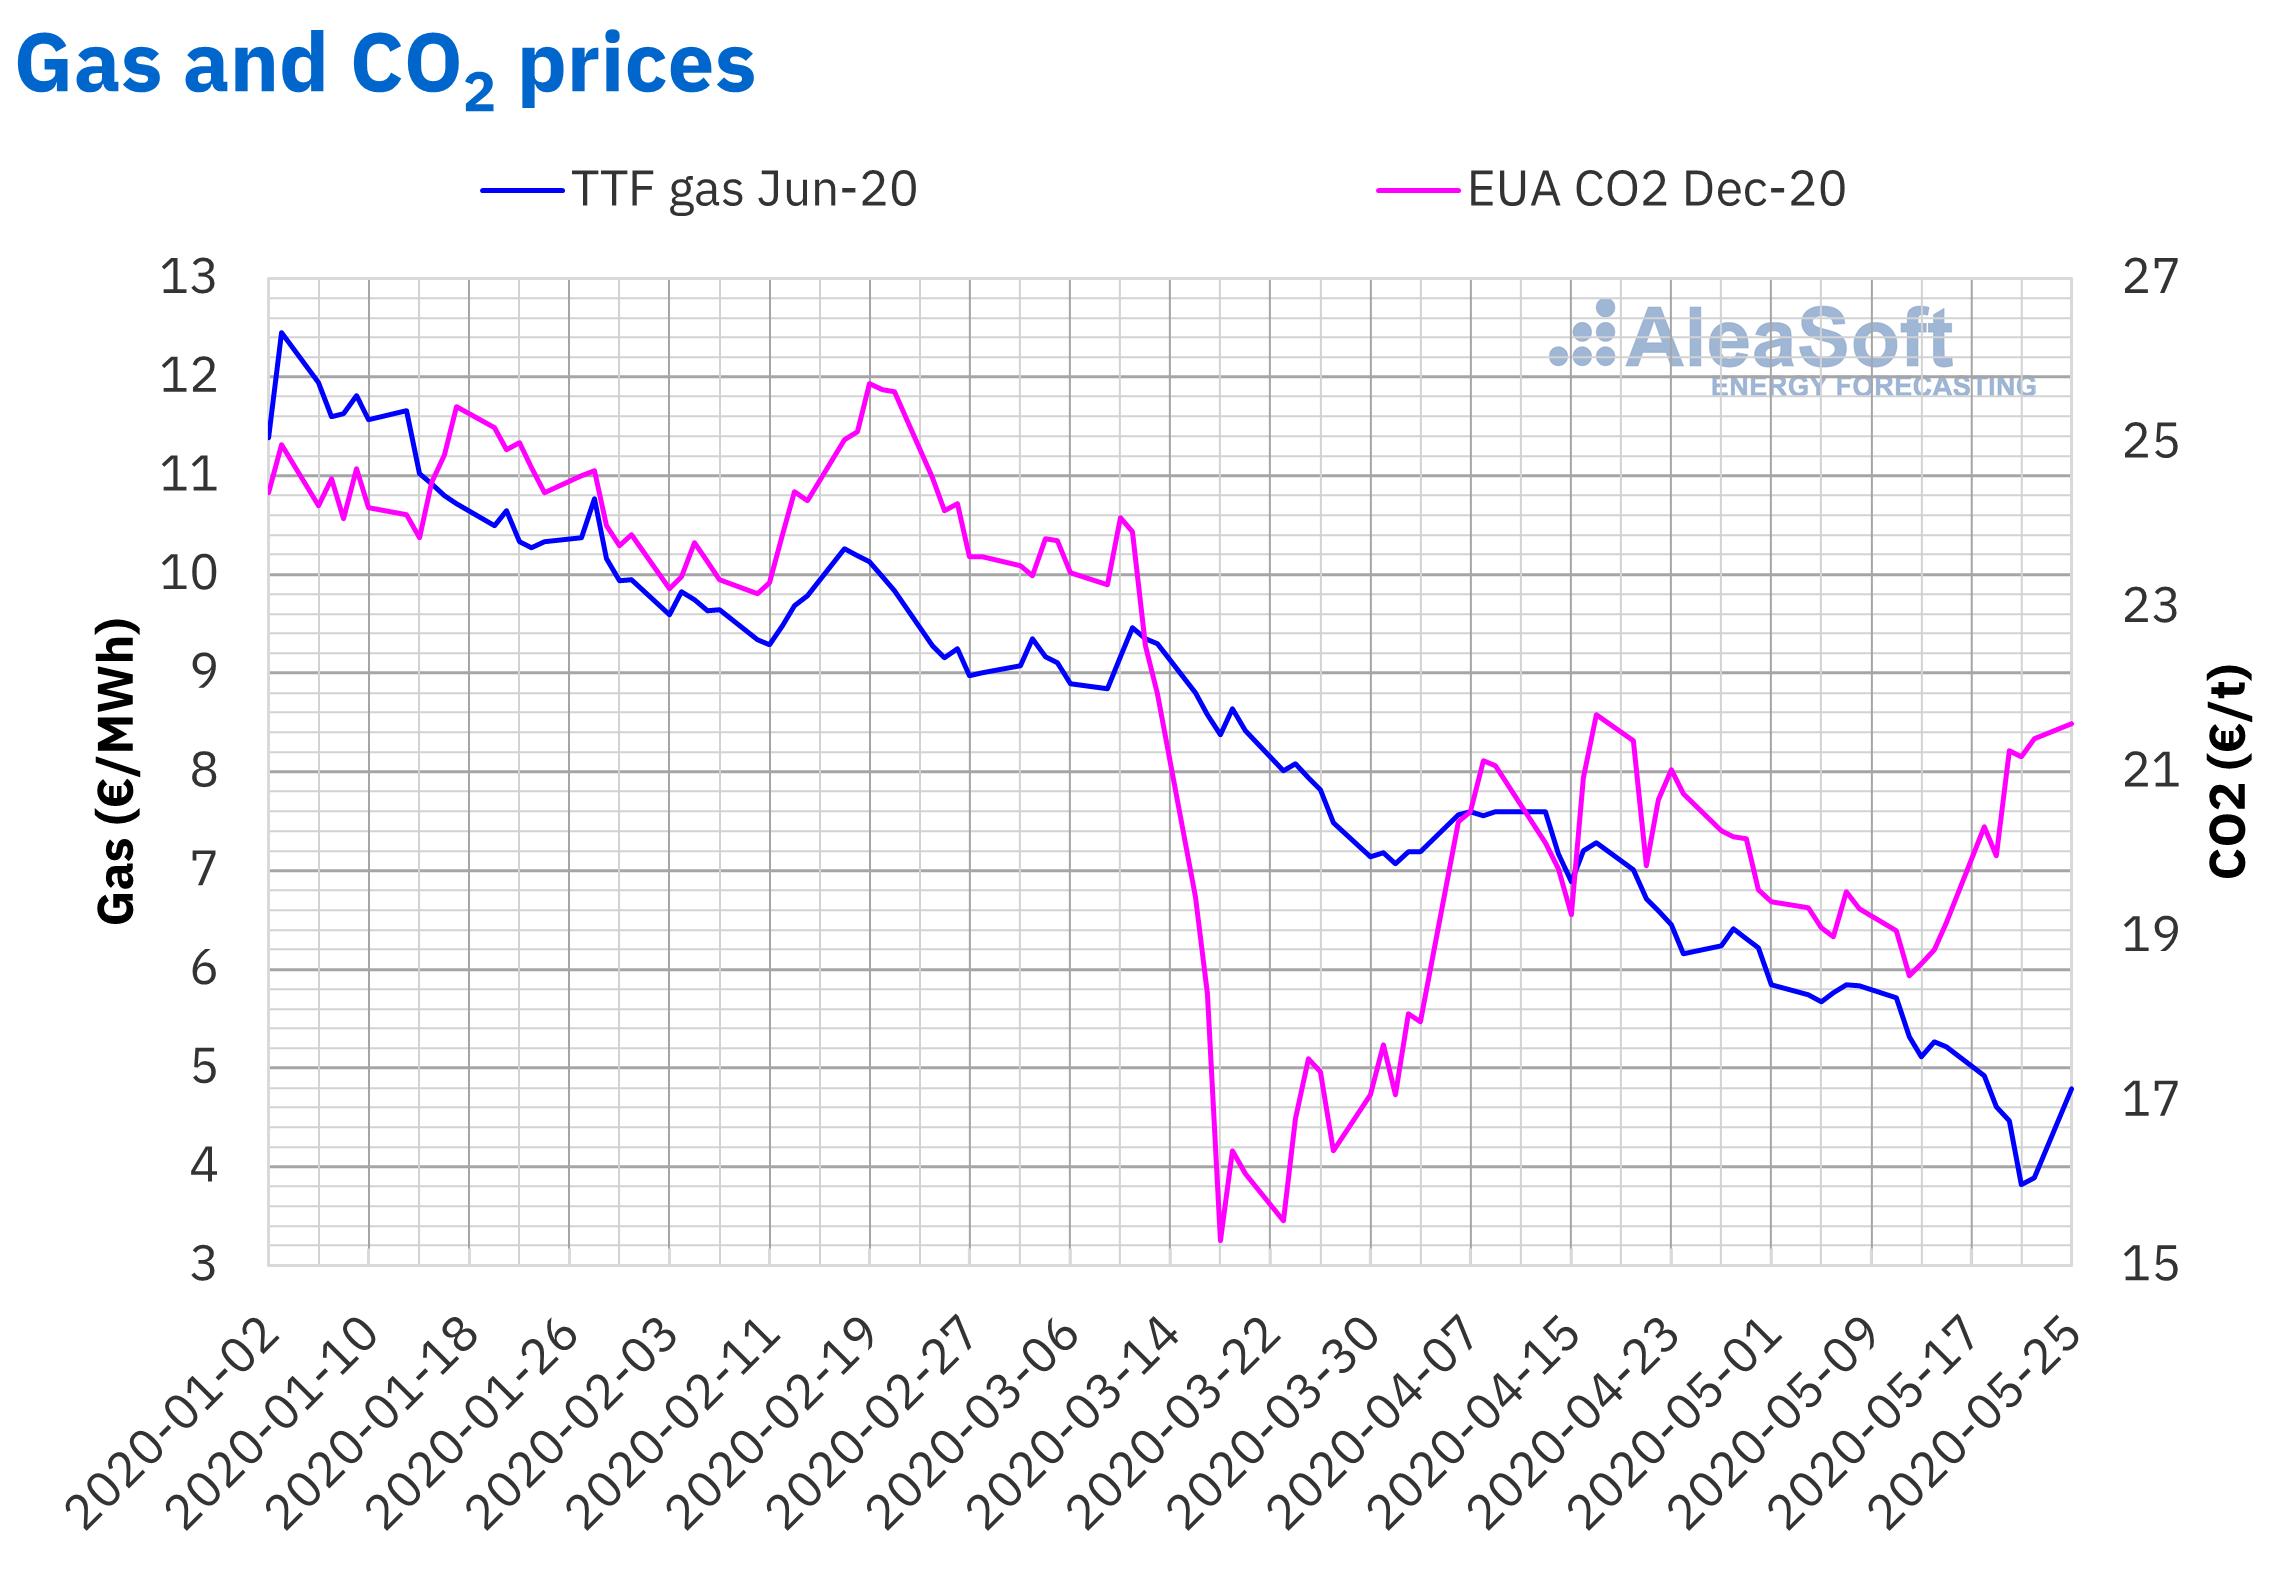 AleaSoft - Prices gas CO2